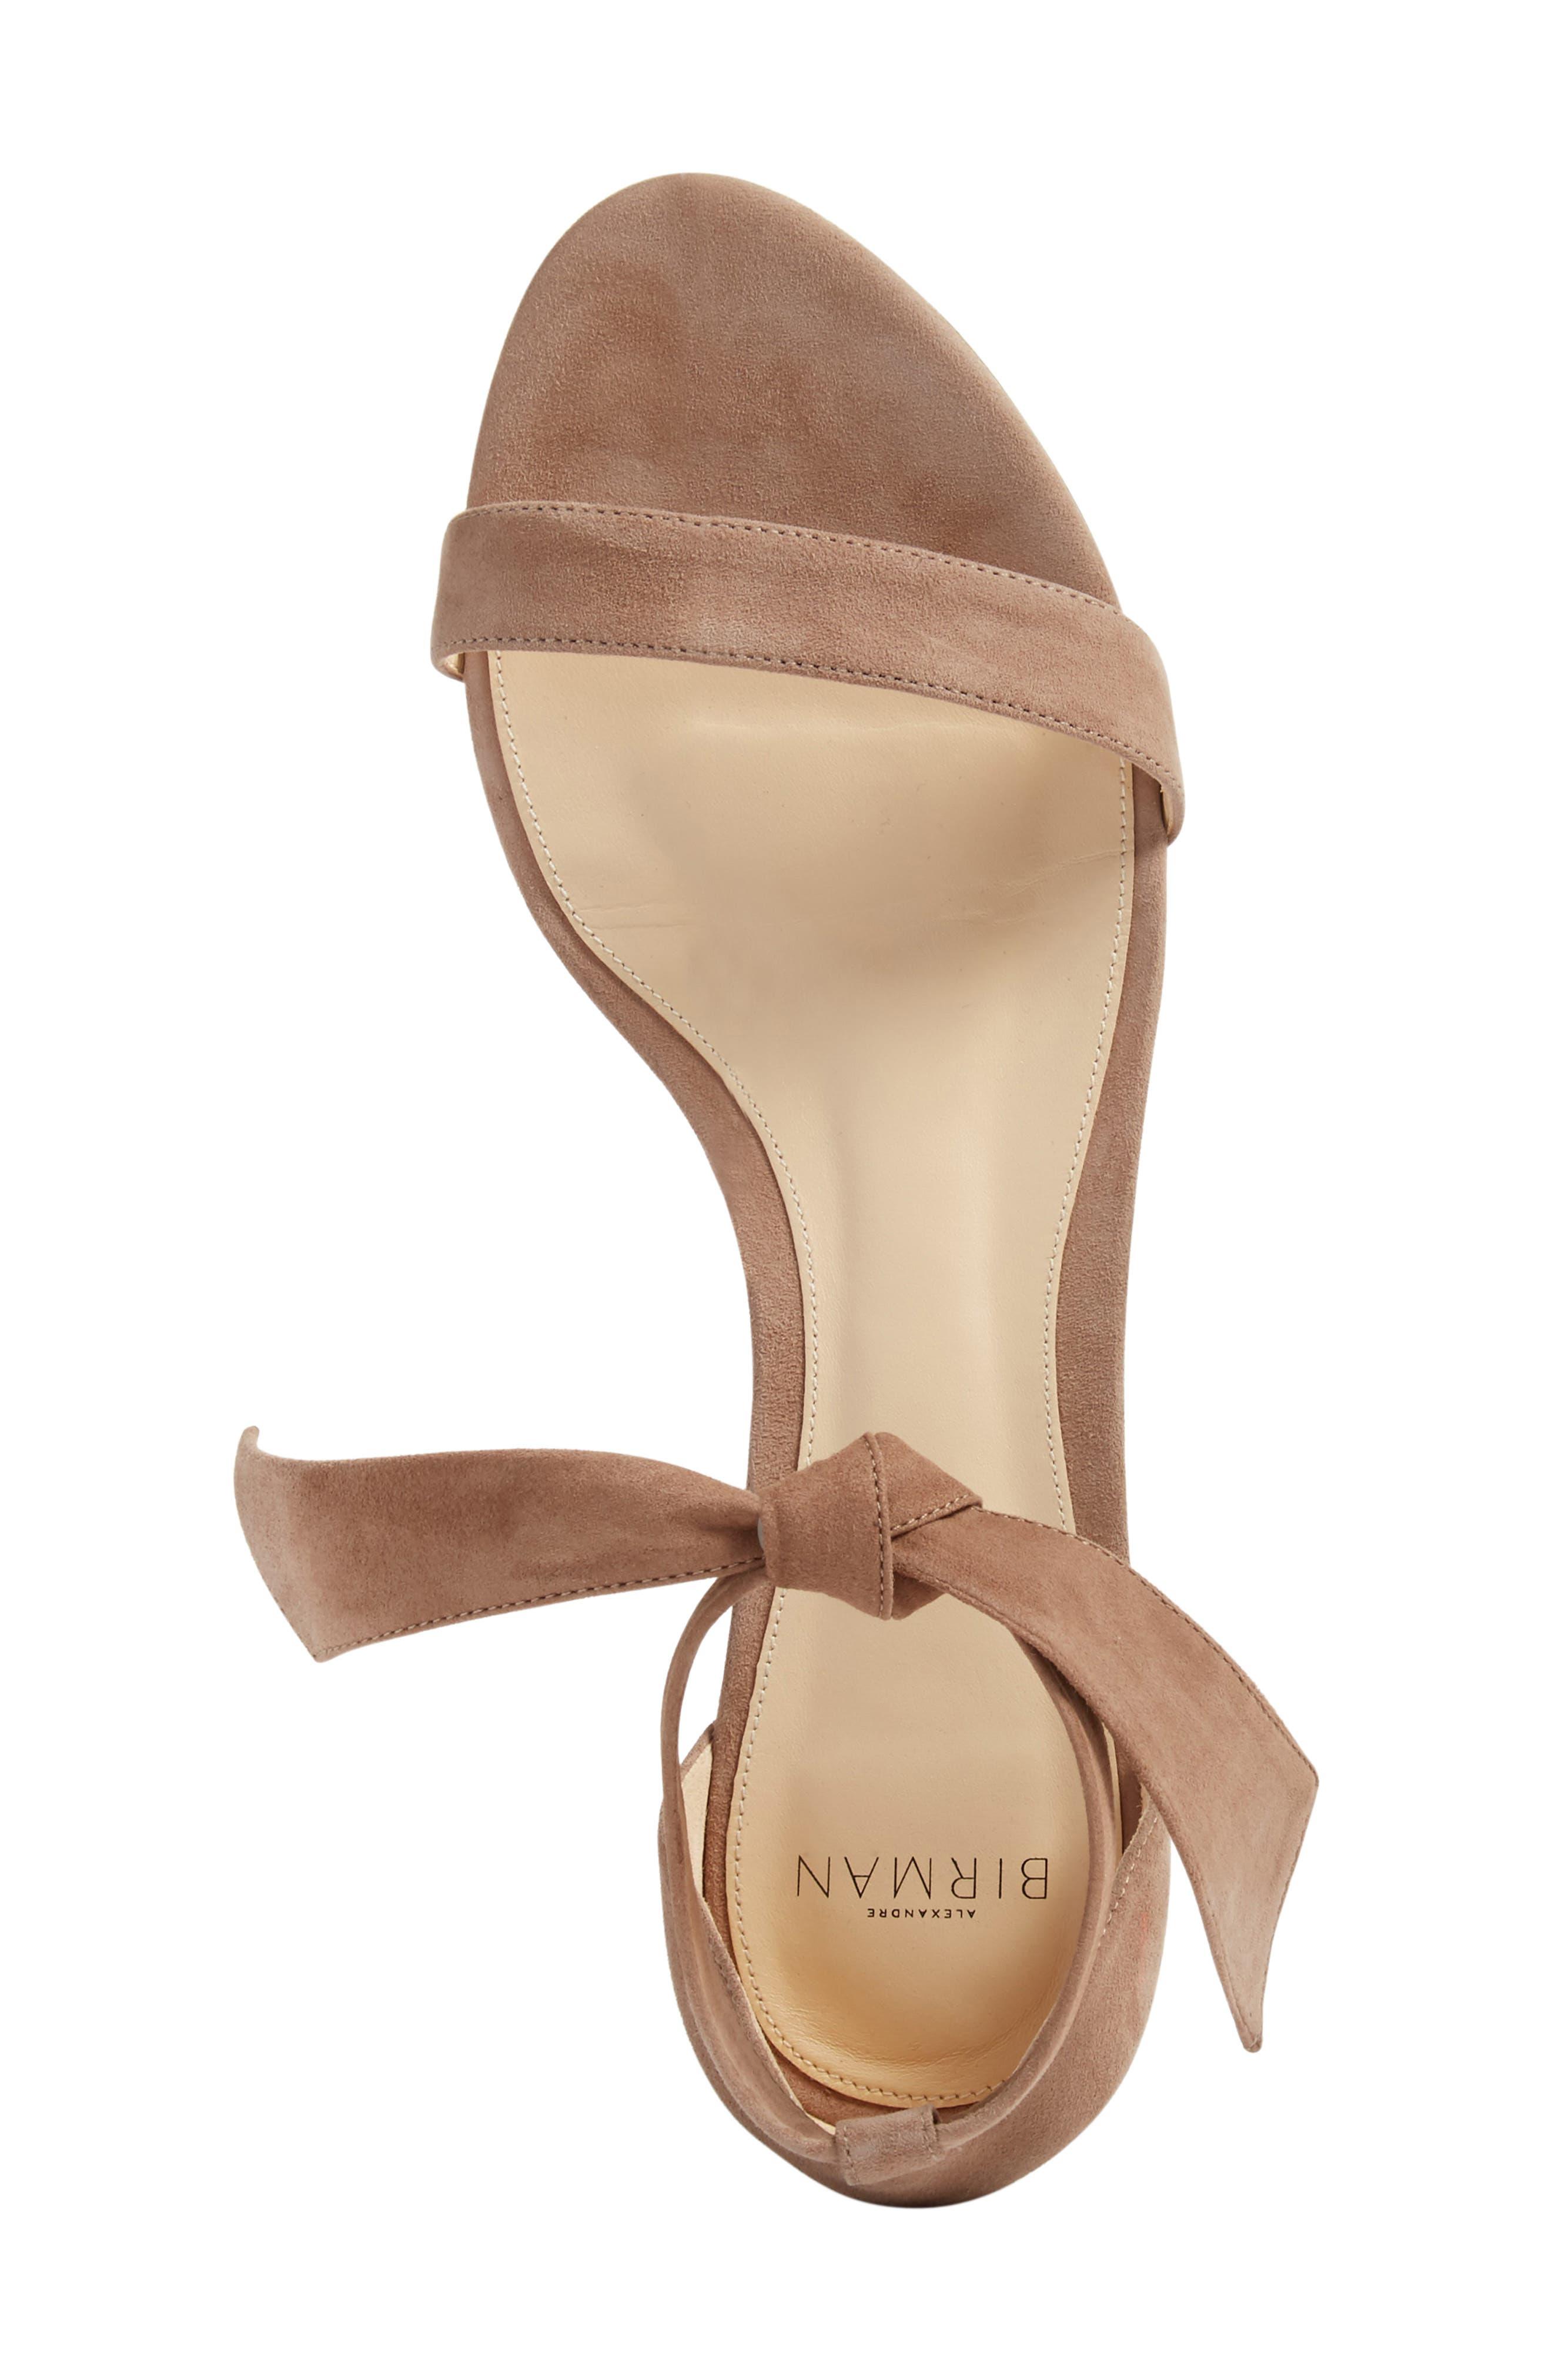 Atena Tie Strap Wedge Sandal,                         Main,                         color, 286